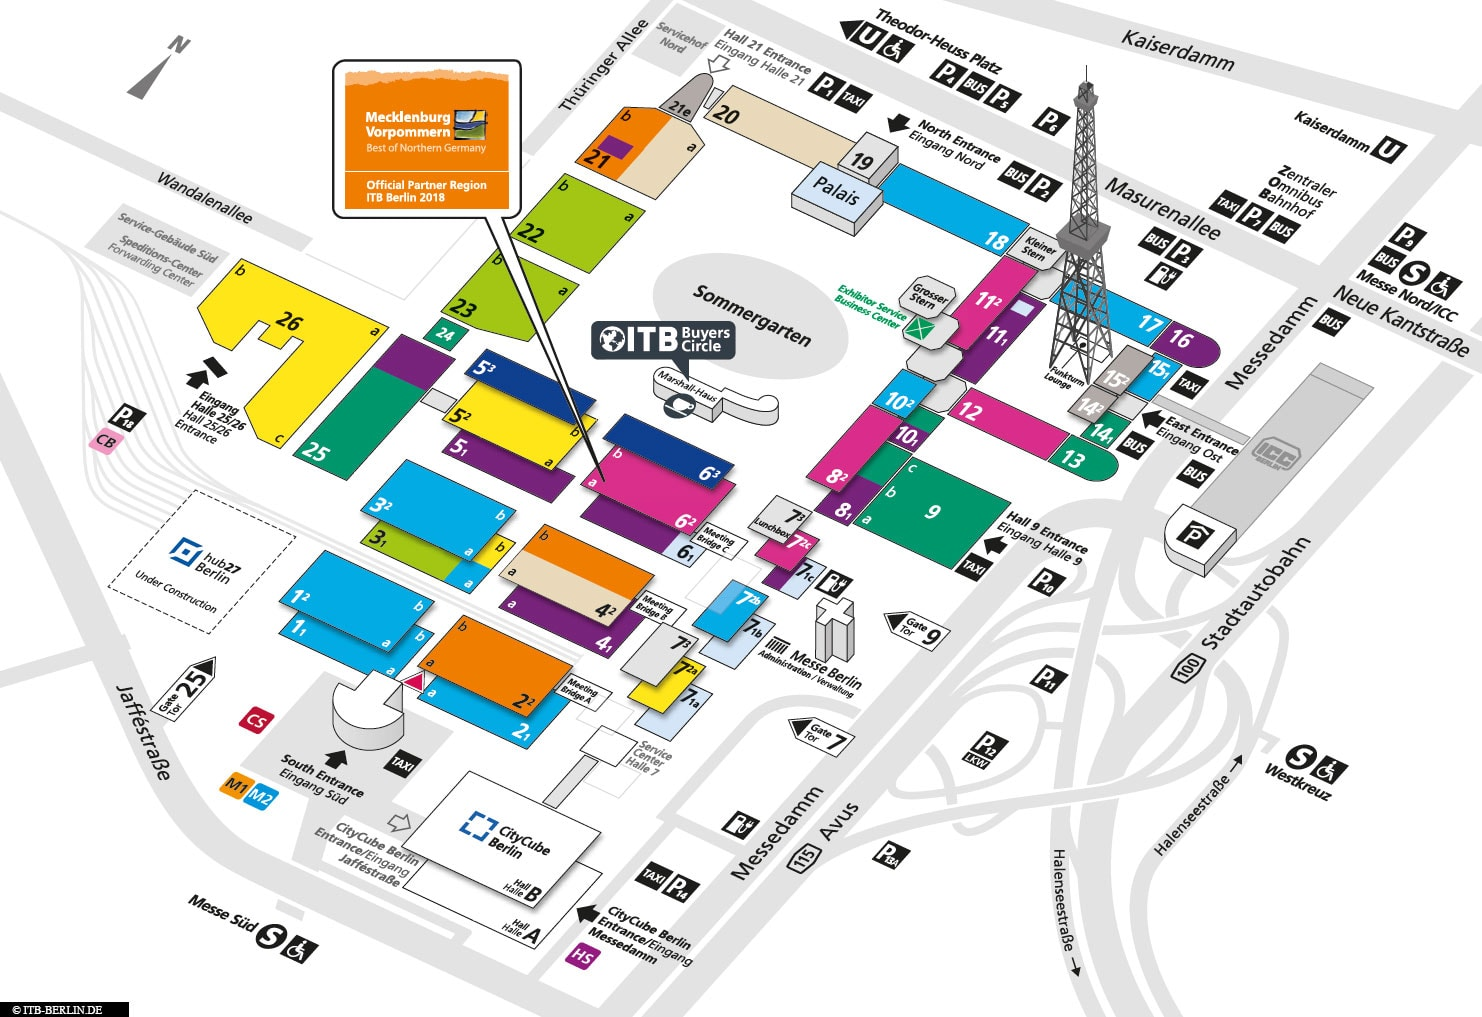 hallenplan, itb berlin 2018, map, fair